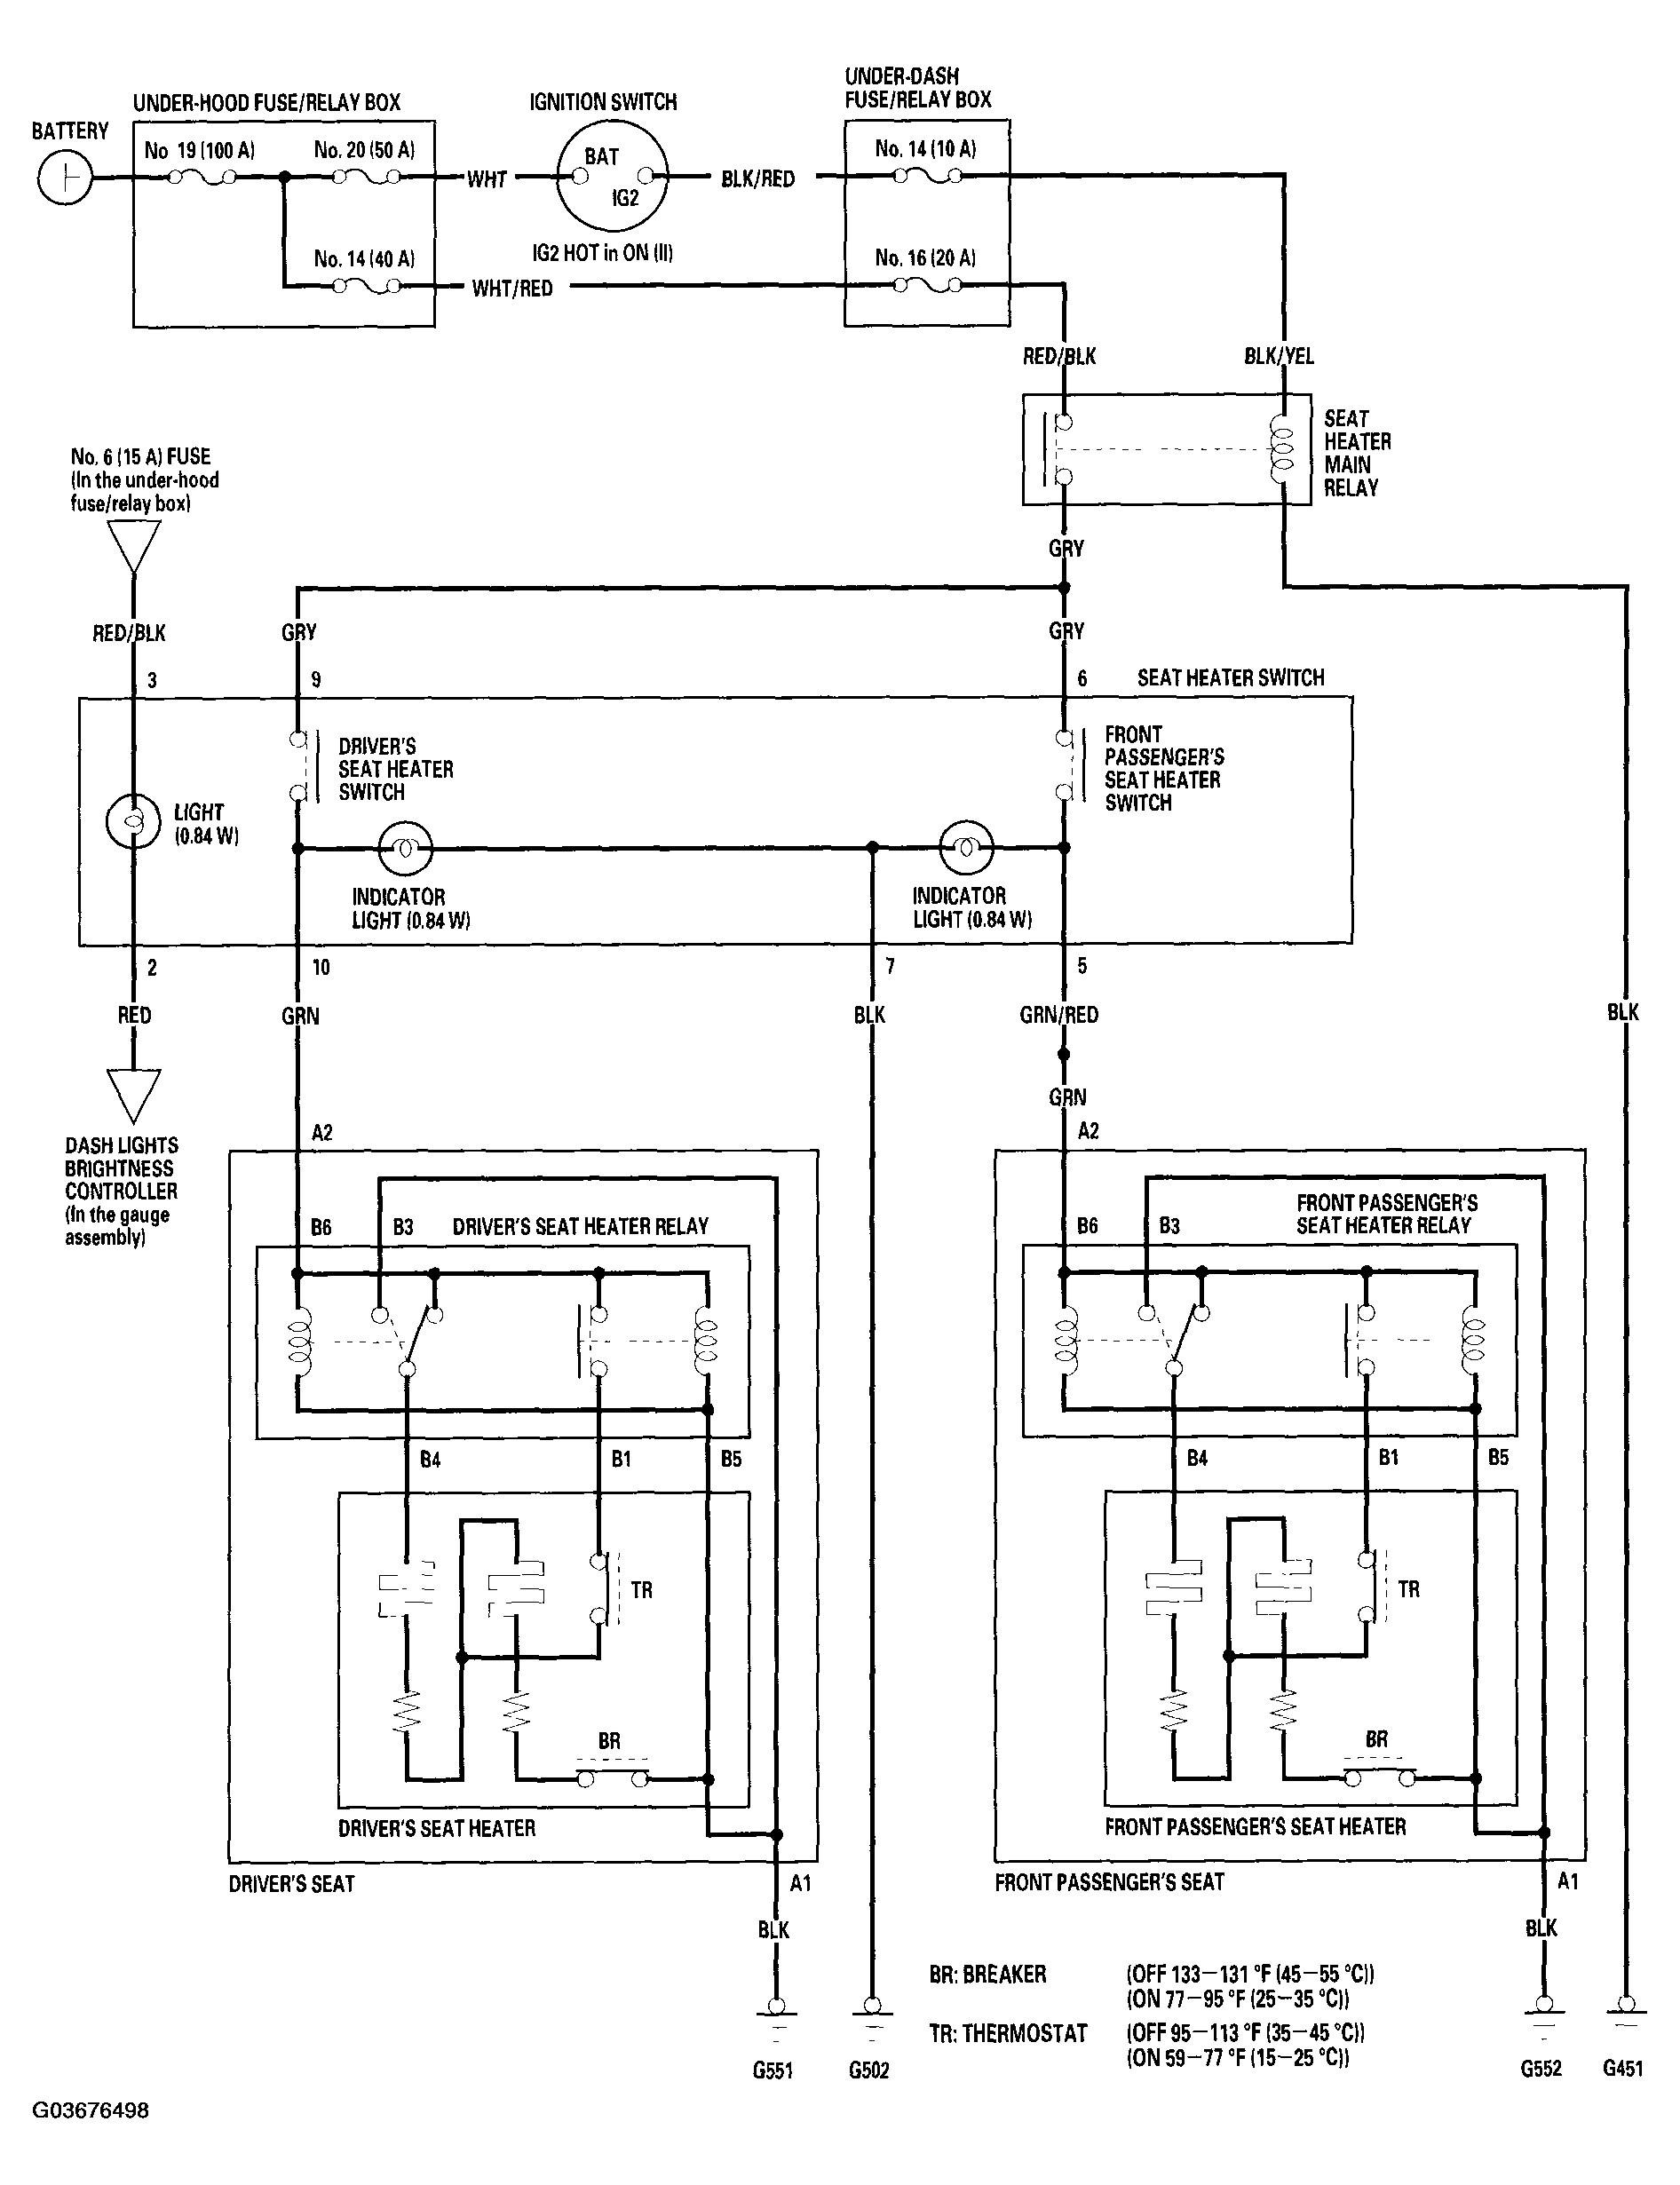 2000 Honda Civic Engine Diagram 1994 Honda Accord Engine Diagram Cr V Fuse Box Diagram Besides Honda Of 2000 Honda Civic Engine Diagram